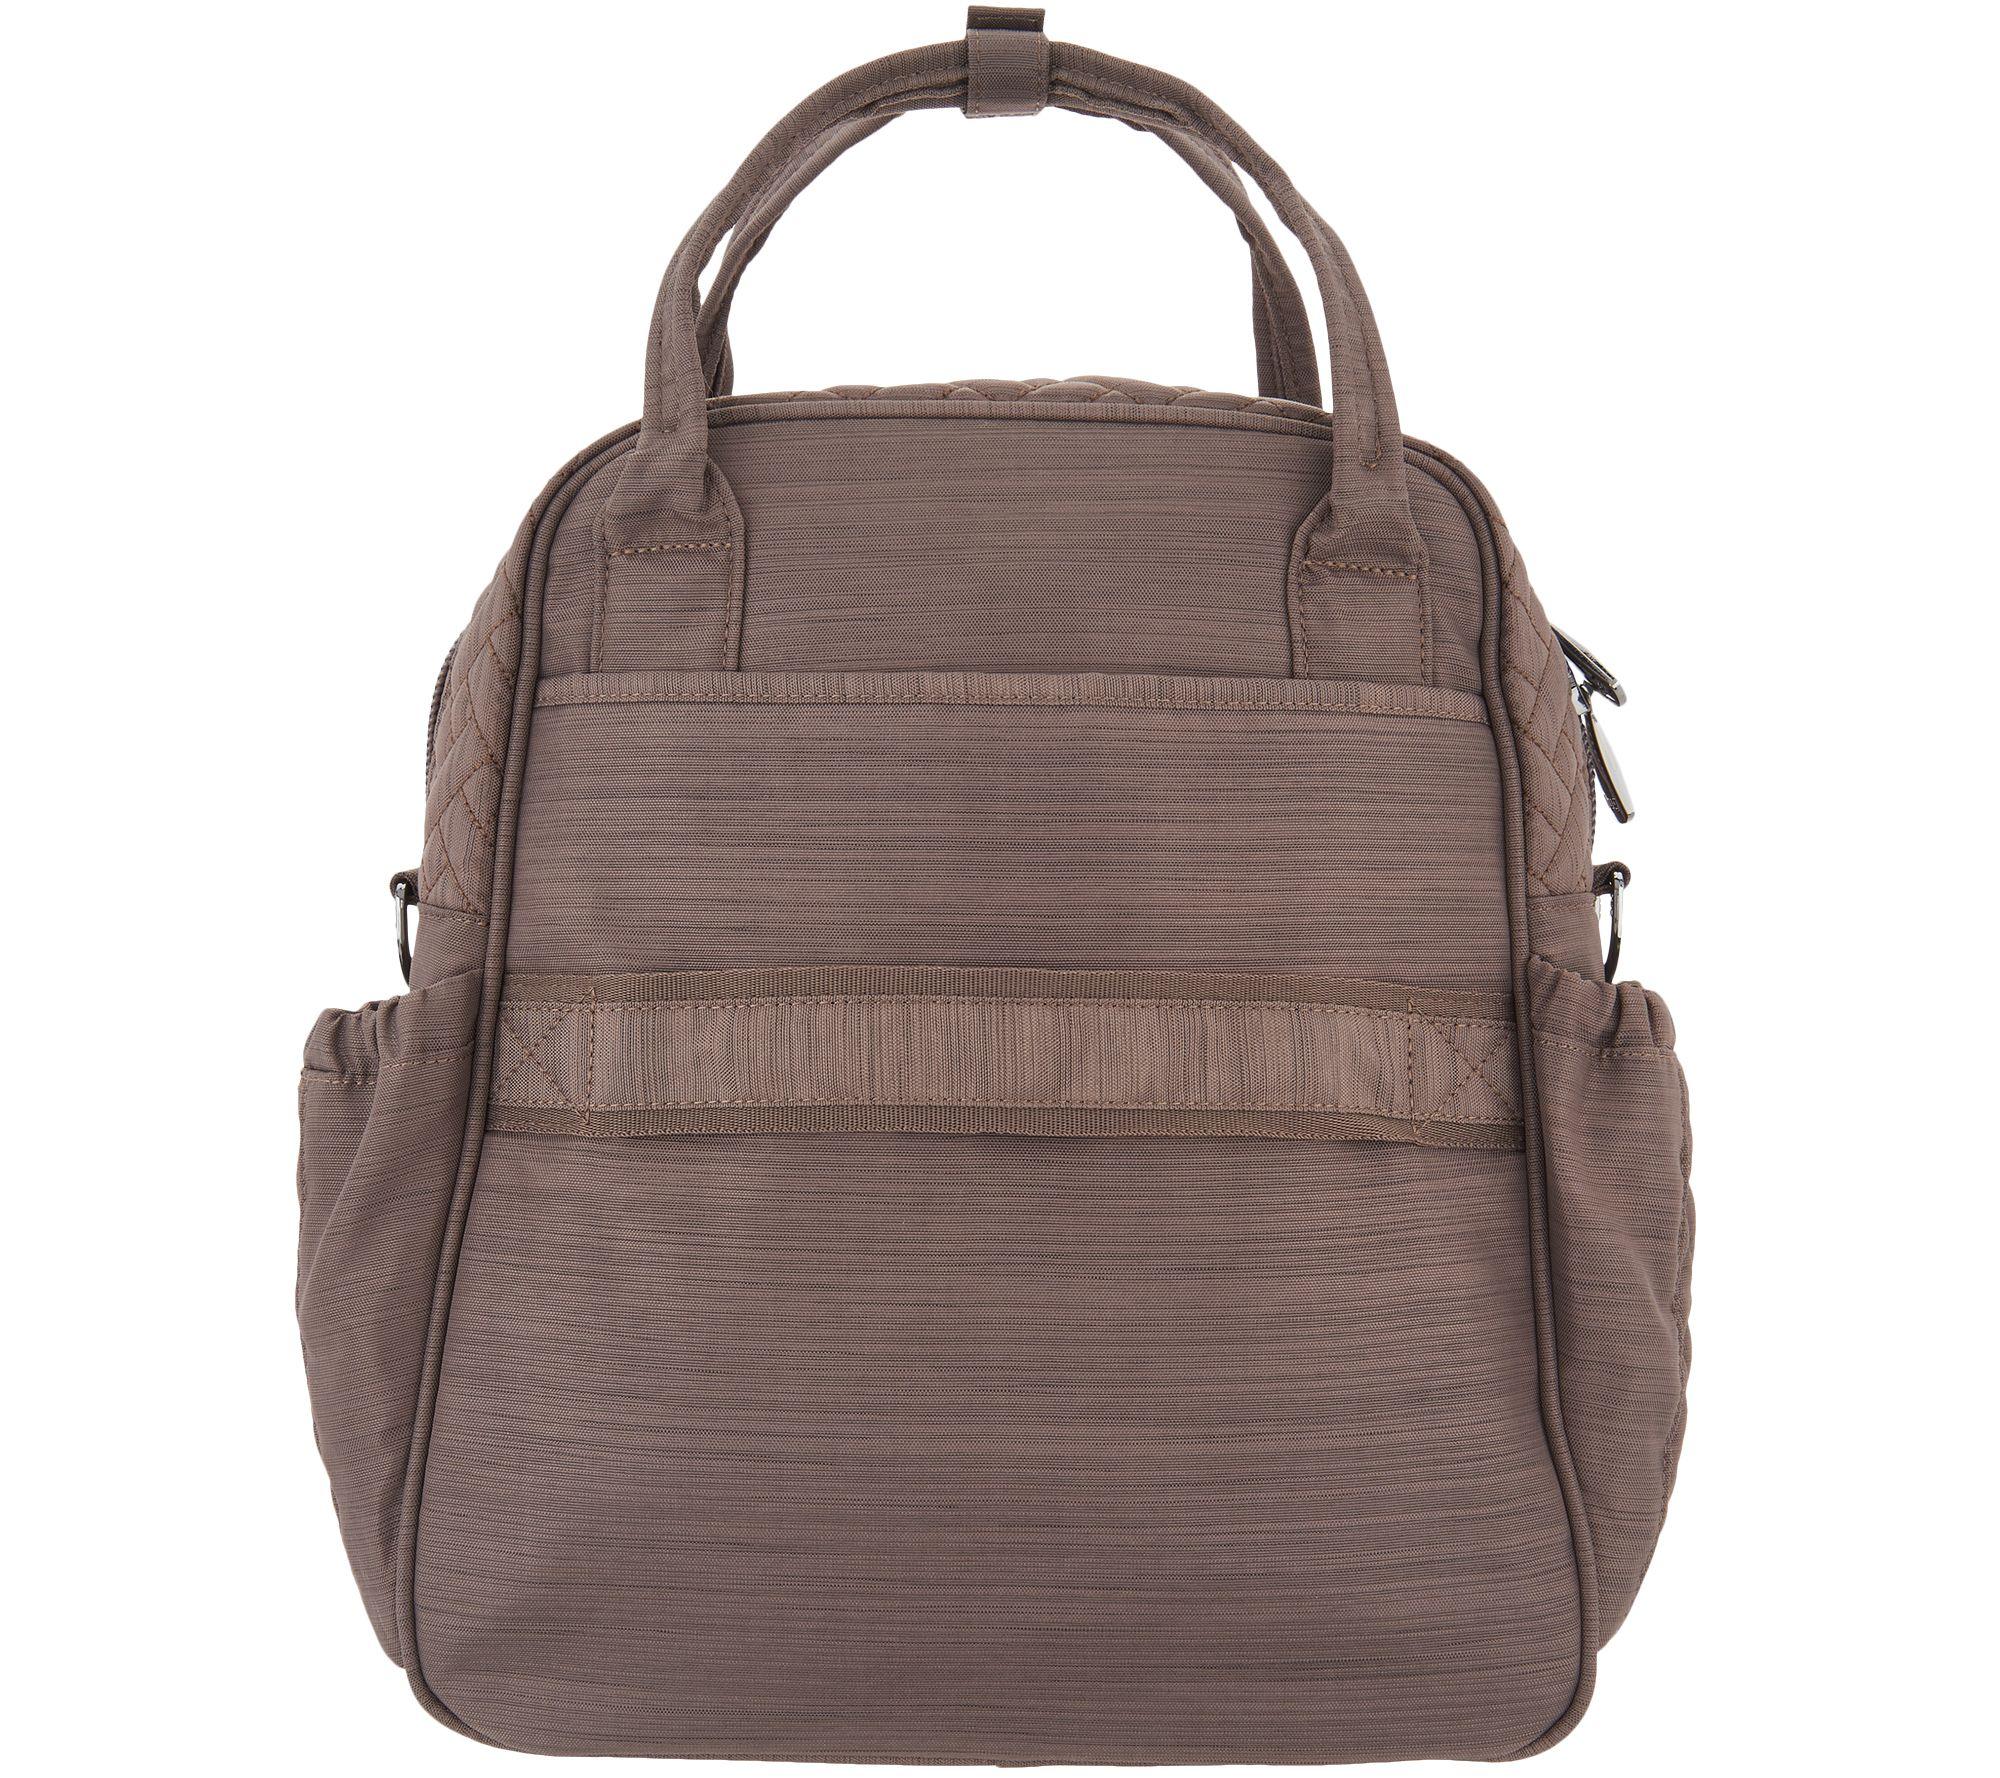 e941e4943 Lug Quilted Day Bag - Mini Puddle Jumper 2 - Page 1 — QVC.com